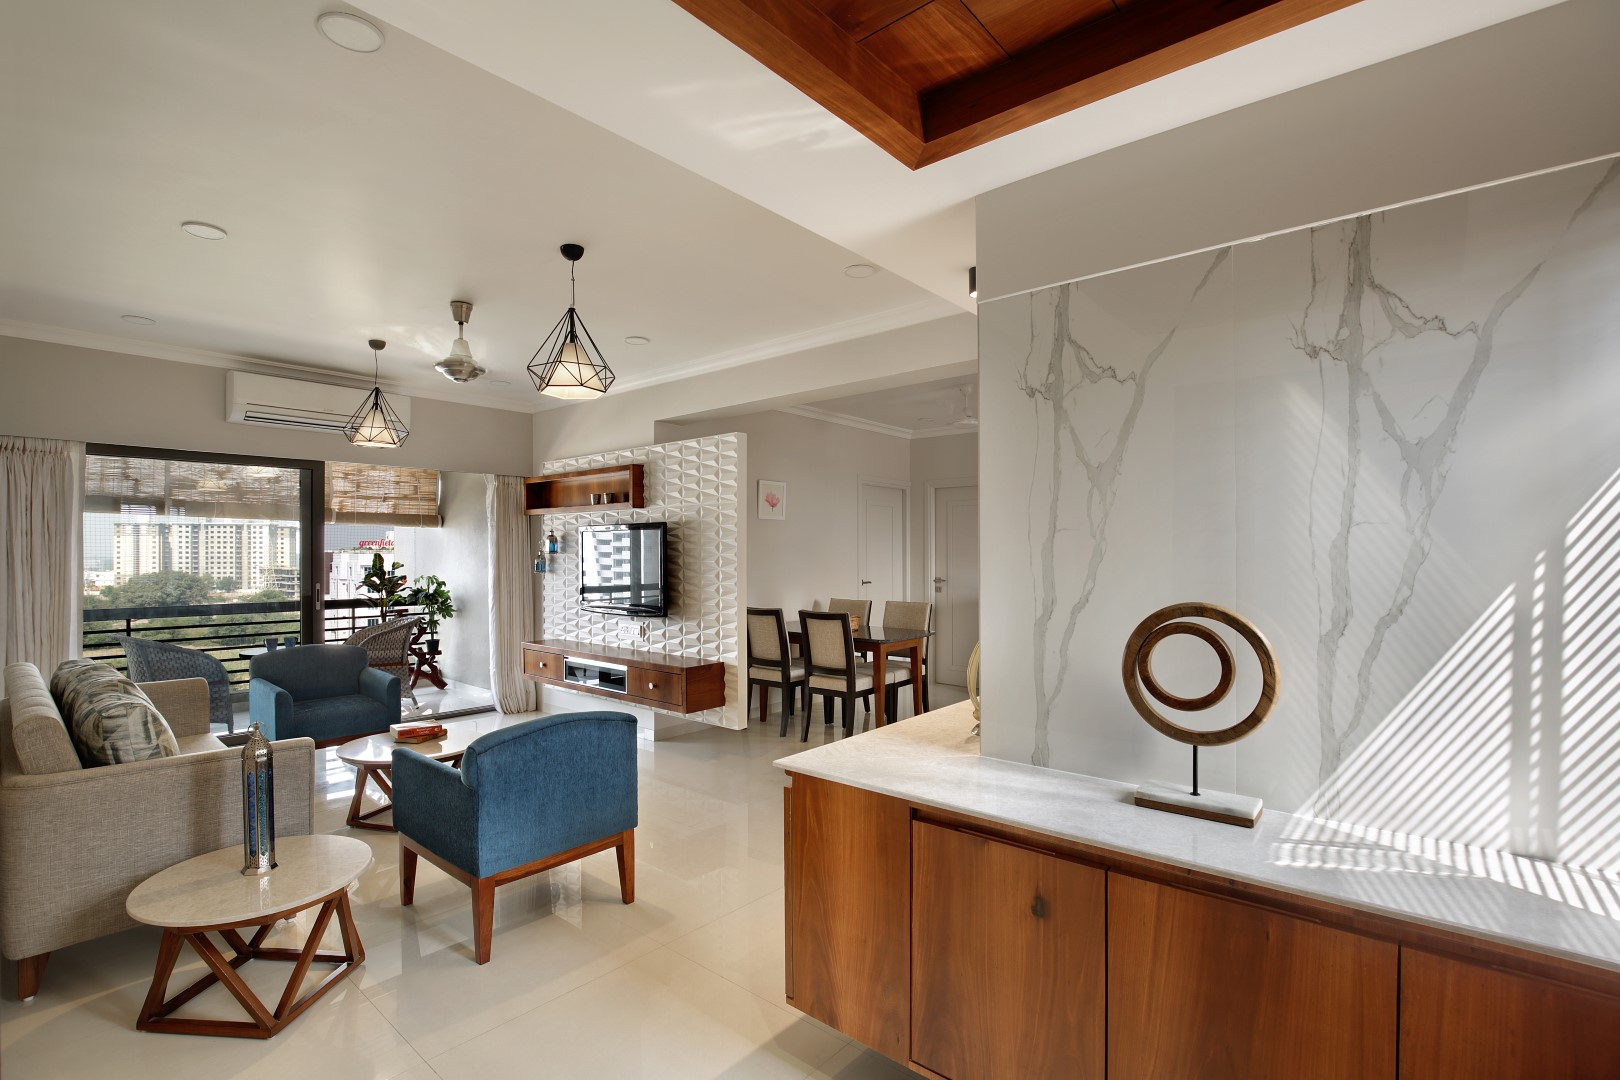 2 Bhk Interior Design Studio 7 Designs The Architects Diary